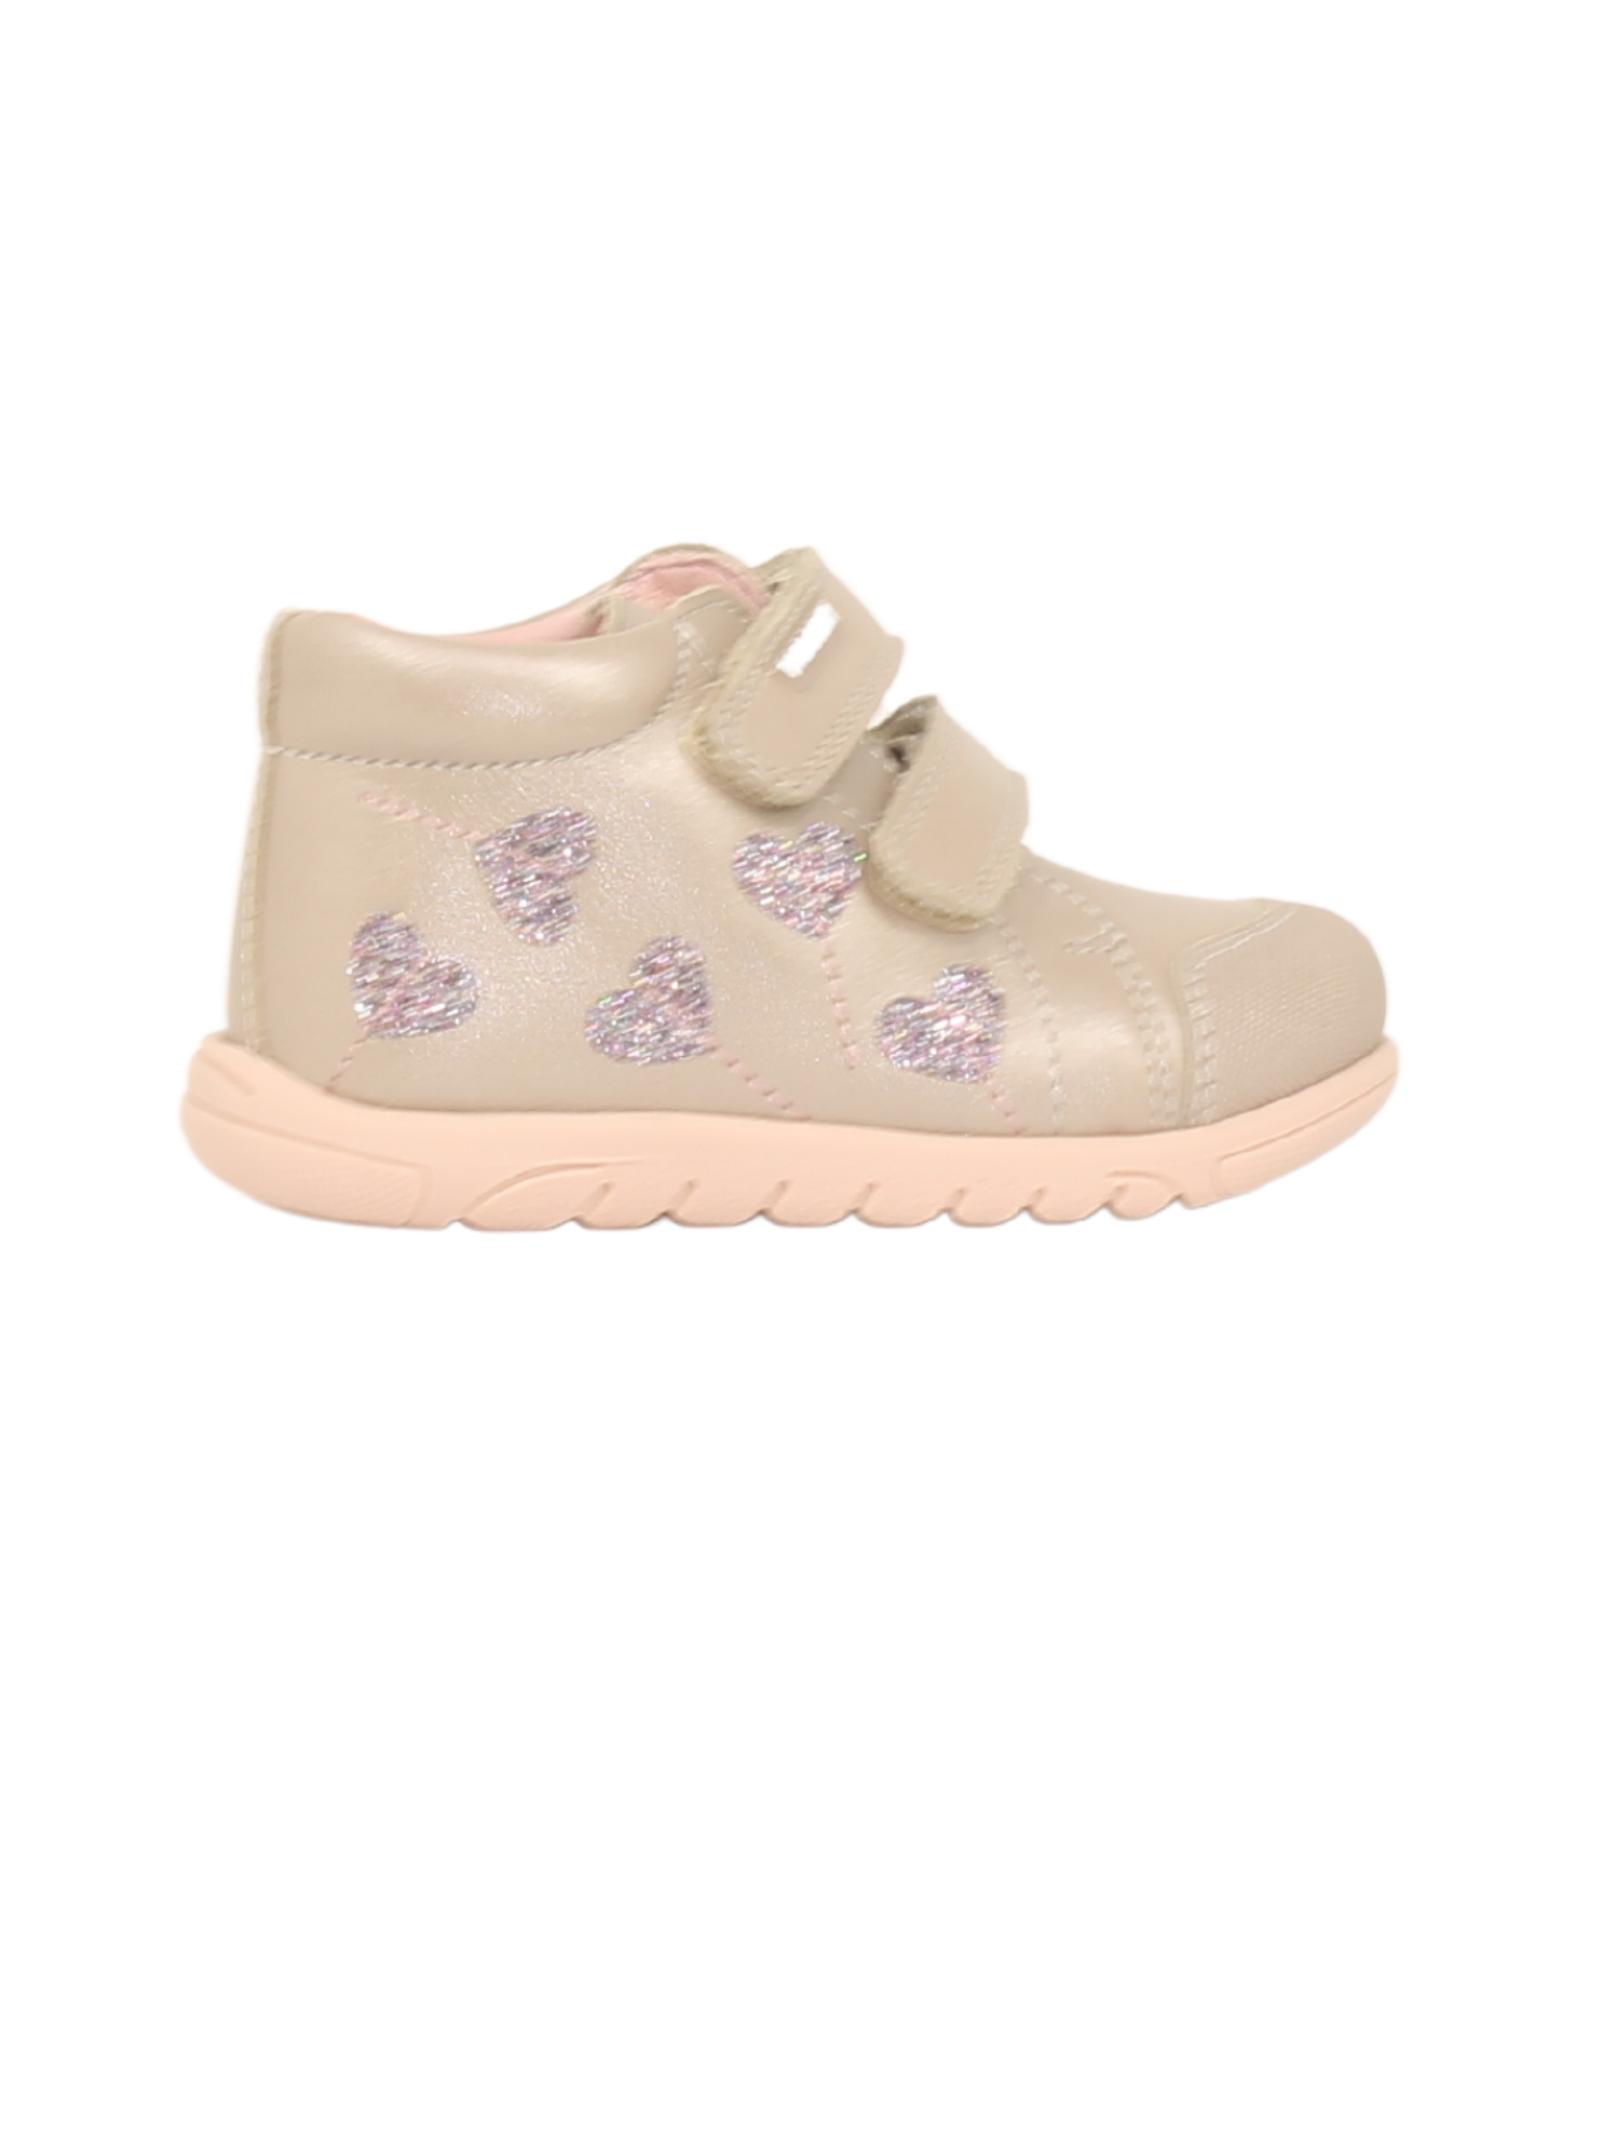 Girls Hearts Sneakers, PABLOSKY | Sneakers | 001932BEIGE